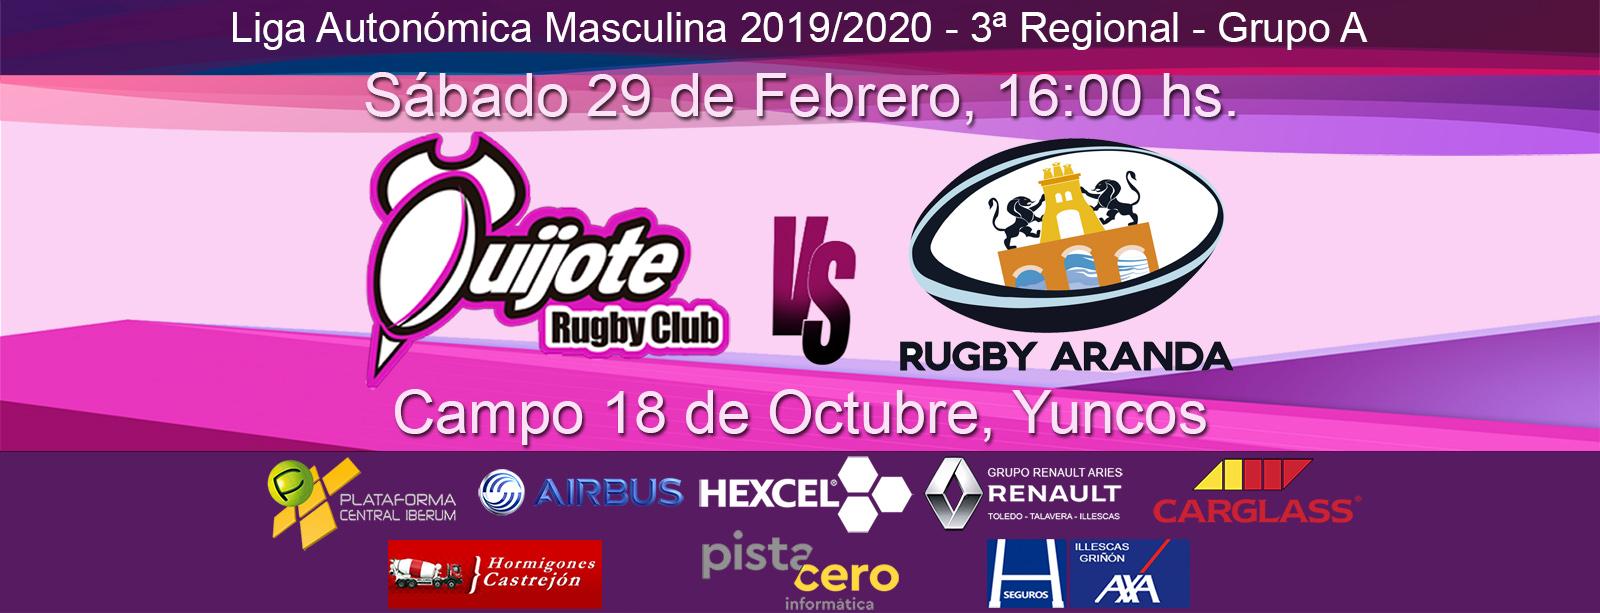 Quijote Rugby Club vs CD Rugby Aranda (29-02-20)